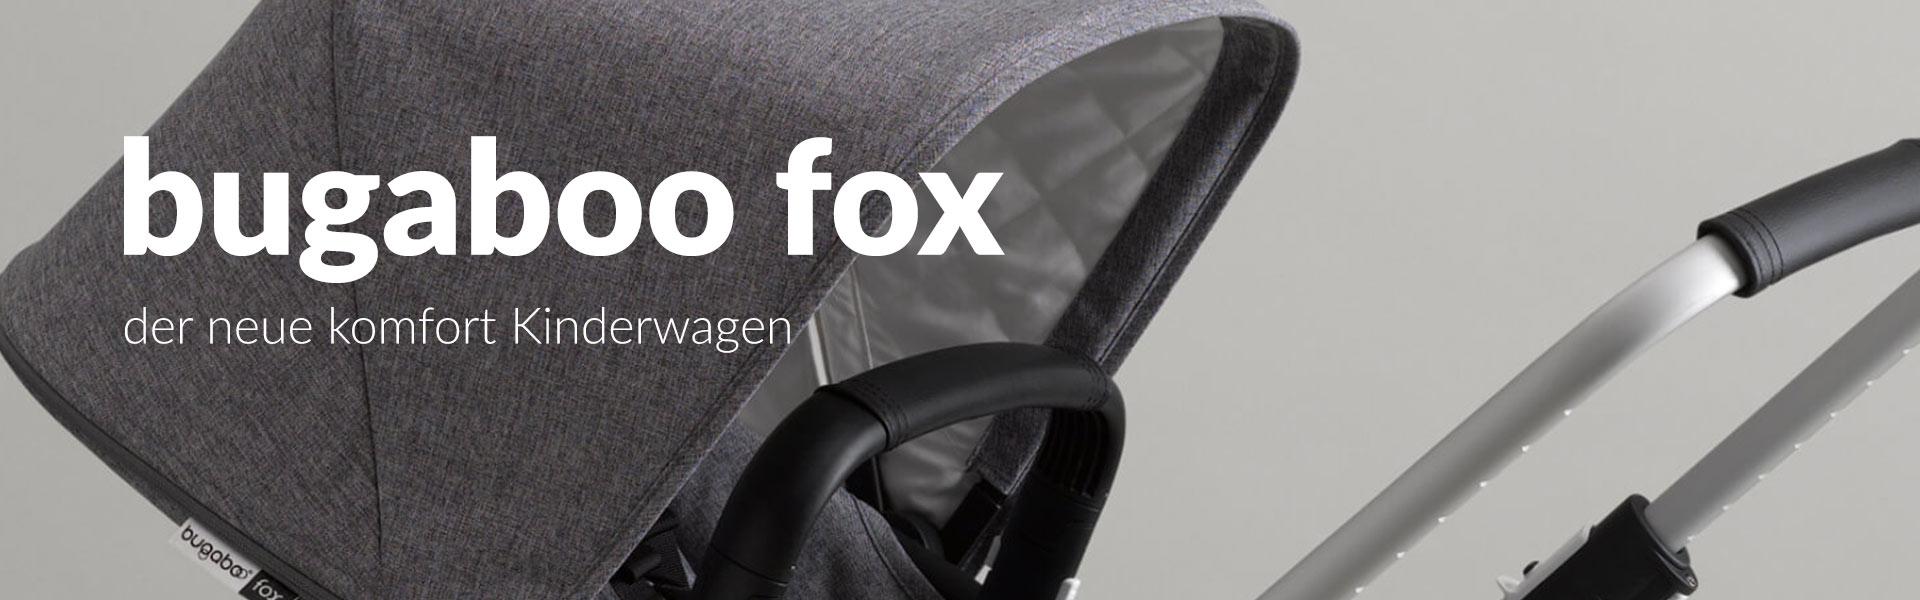 Bugaboo Fox+ Kinderwagen - Artikel